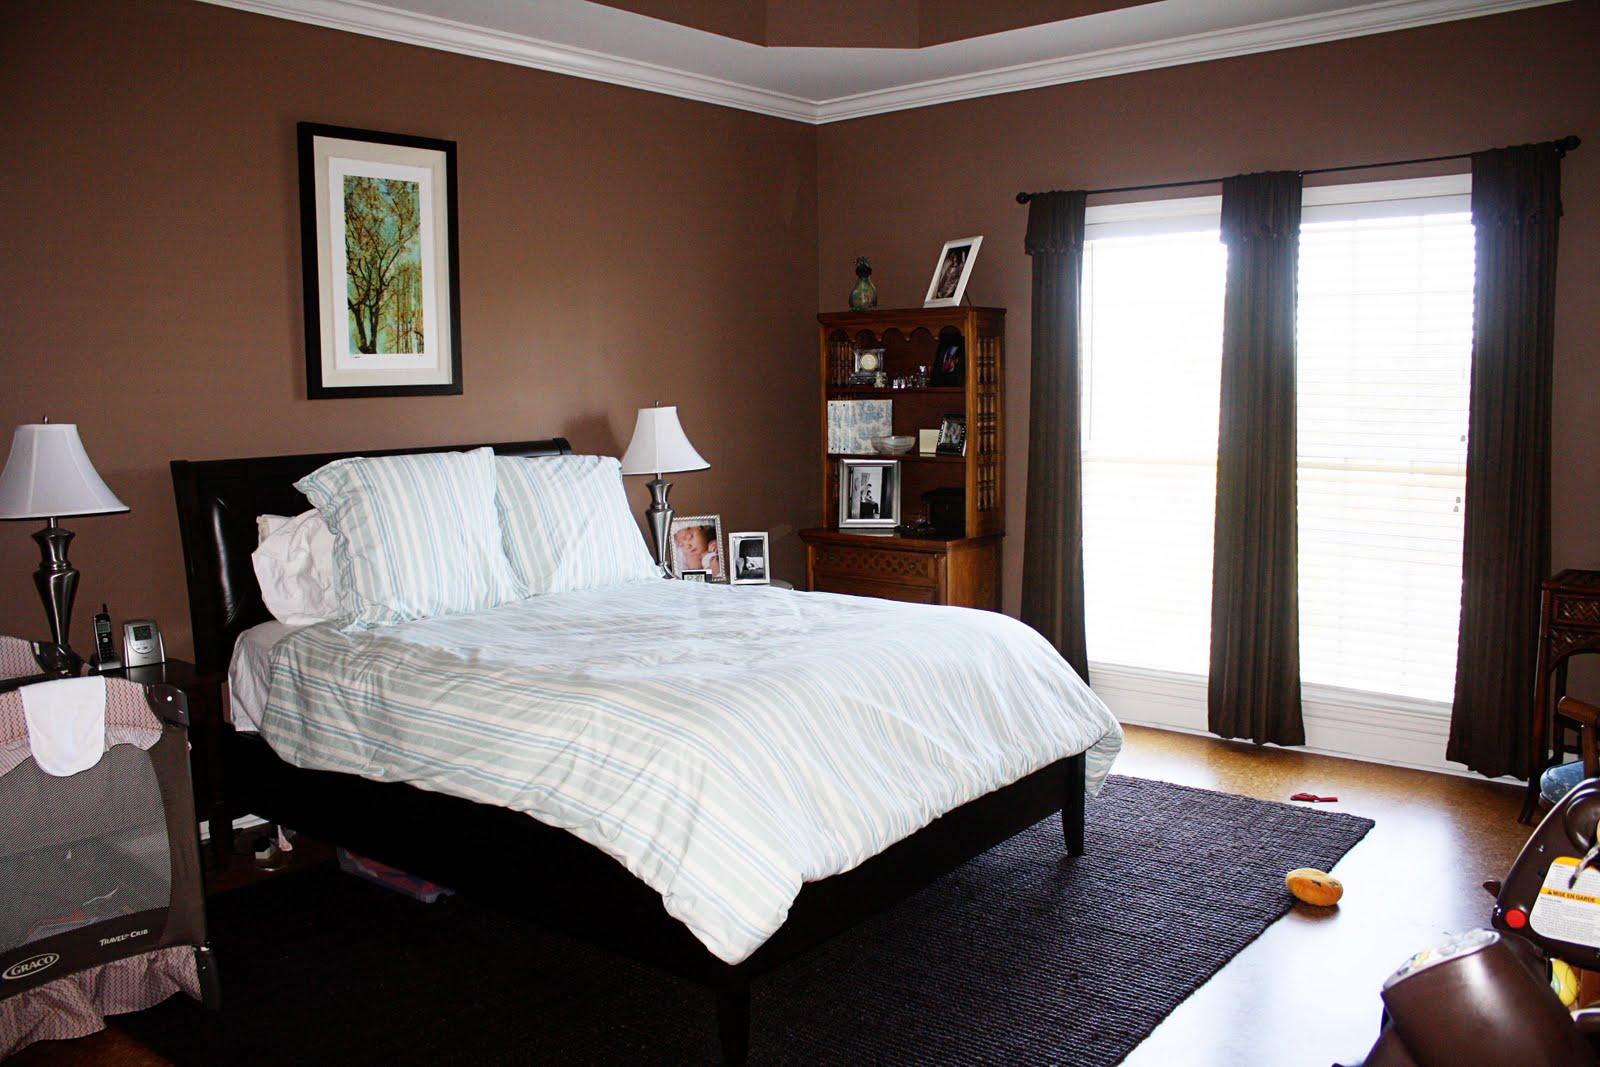 mismatched bedroom furniture ideas photo - 7